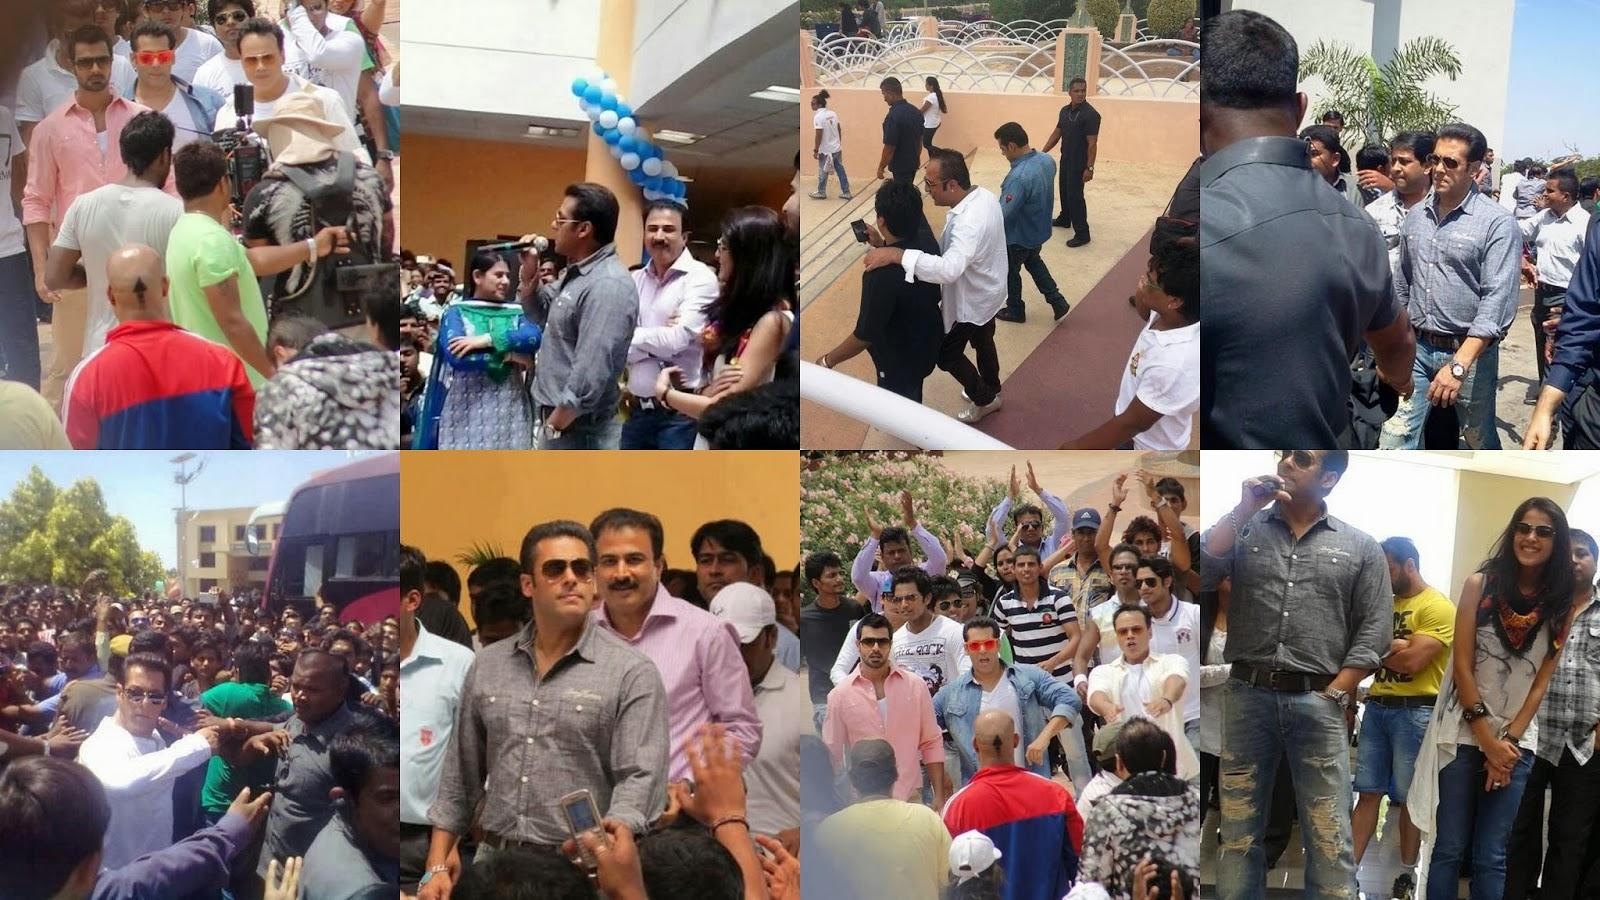 Salman Khan behind the scene on shoot of Jai Ho movie